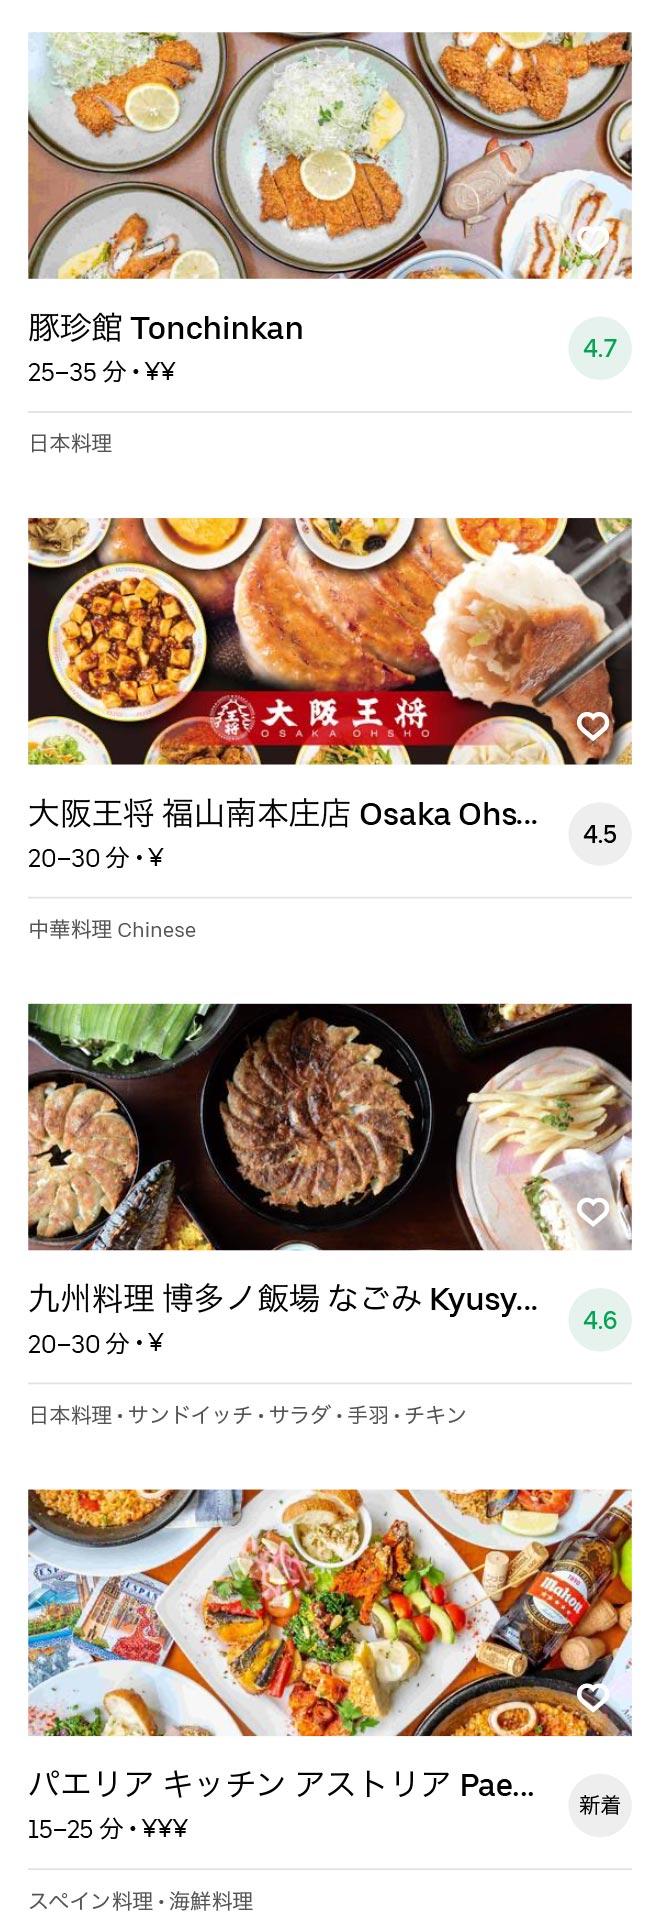 Fukuyama menu 2010 07